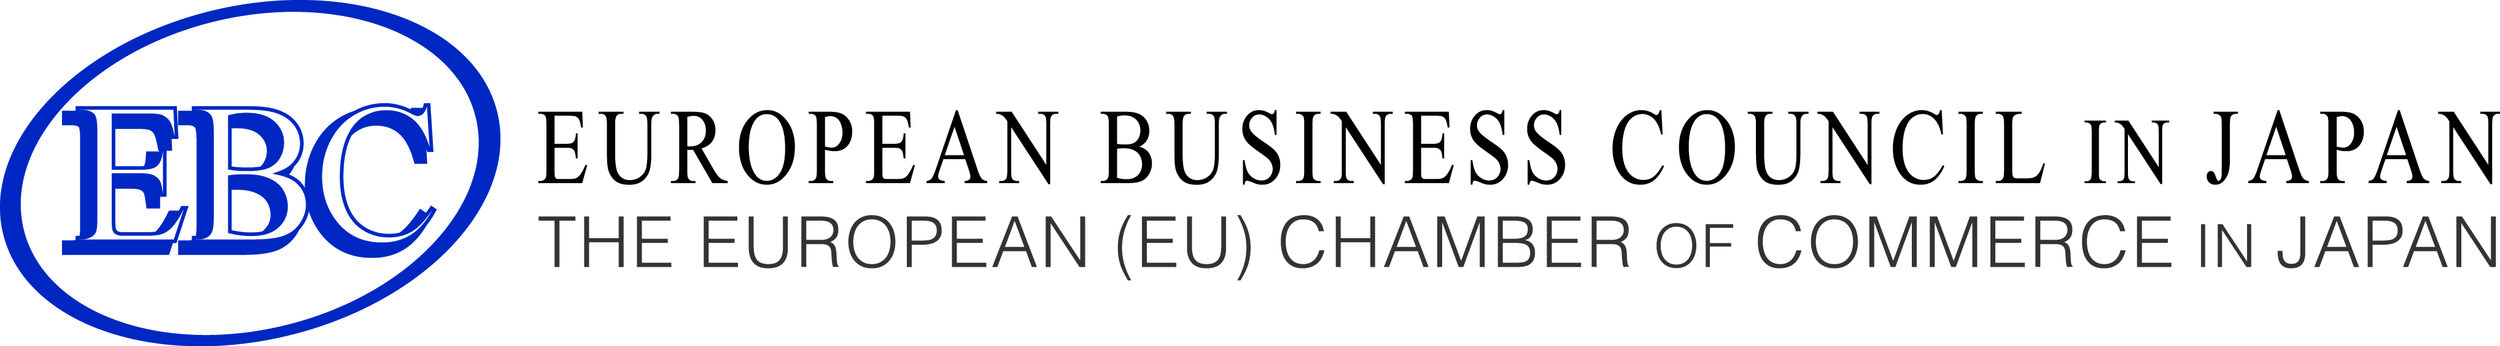 EBC-EU-Japan-EPA-Forum-trade-investment-M-and-A-Europe